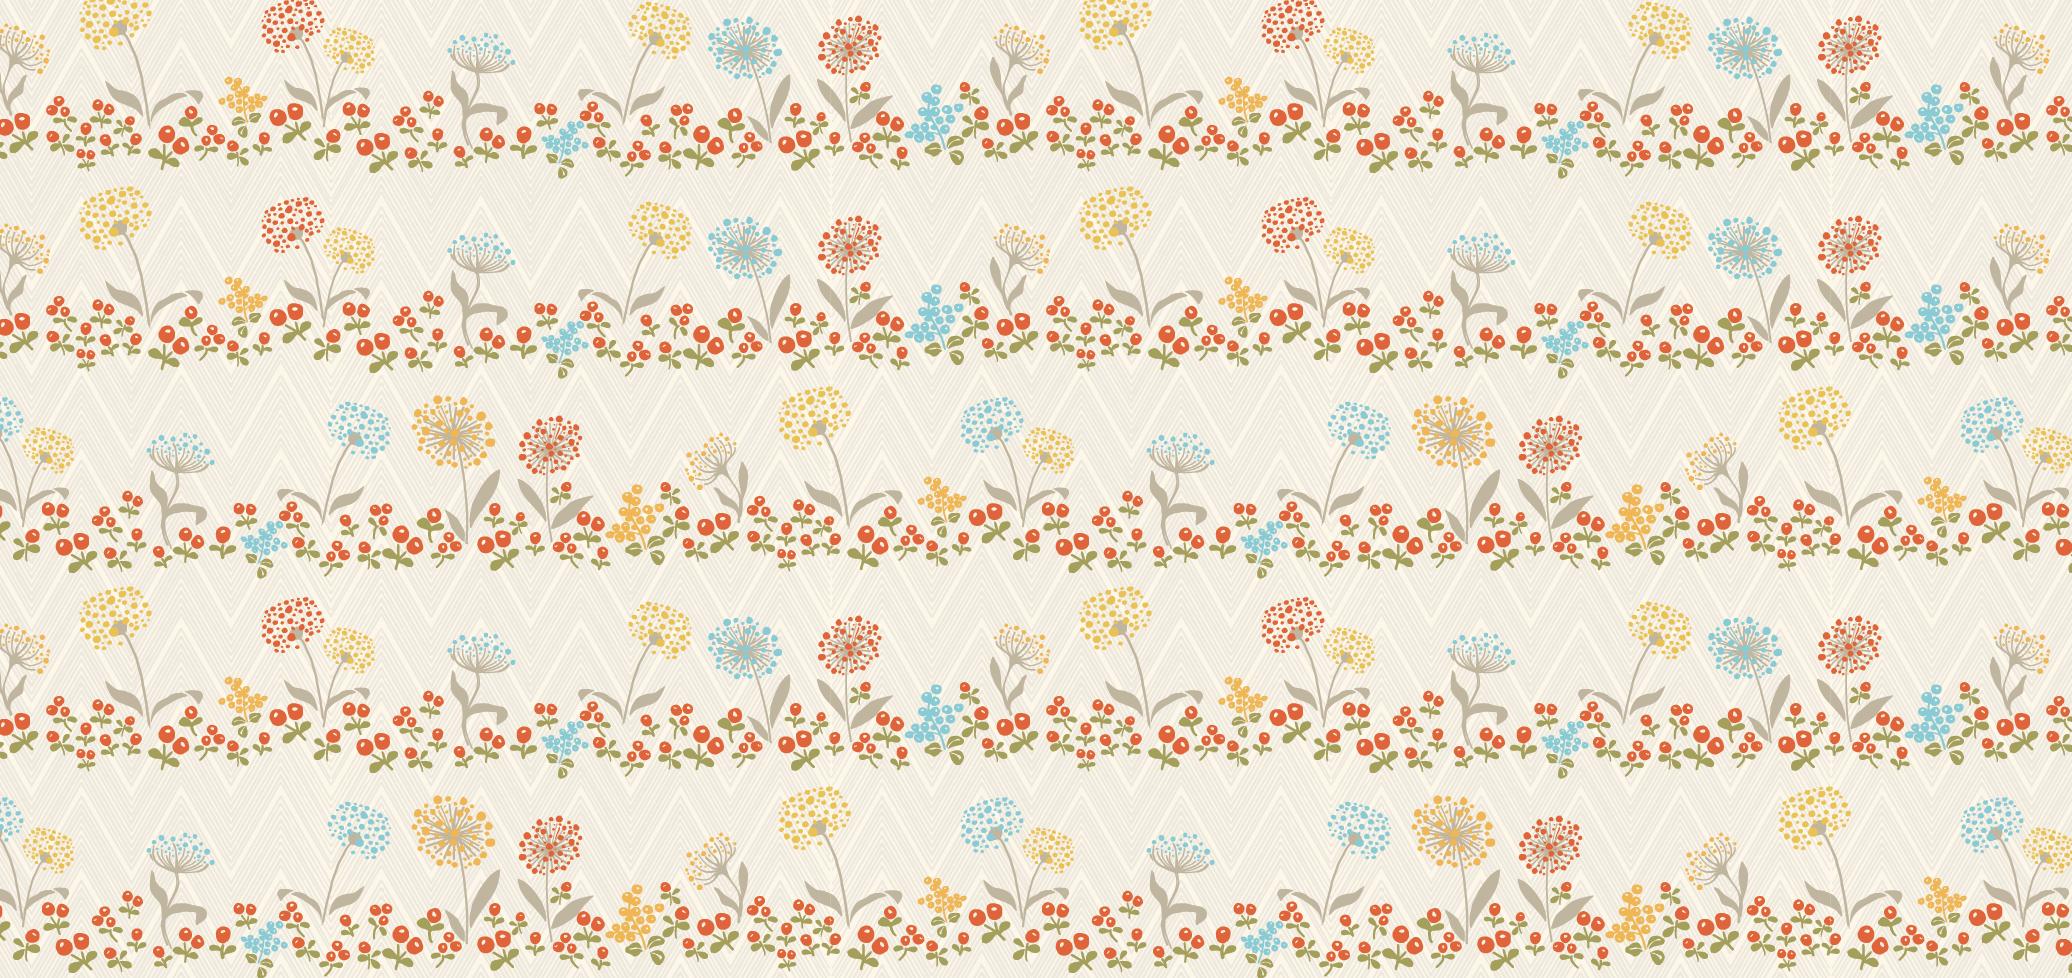 elena-wilken-walk-in-the-countryside-surface-pattern-design4.png